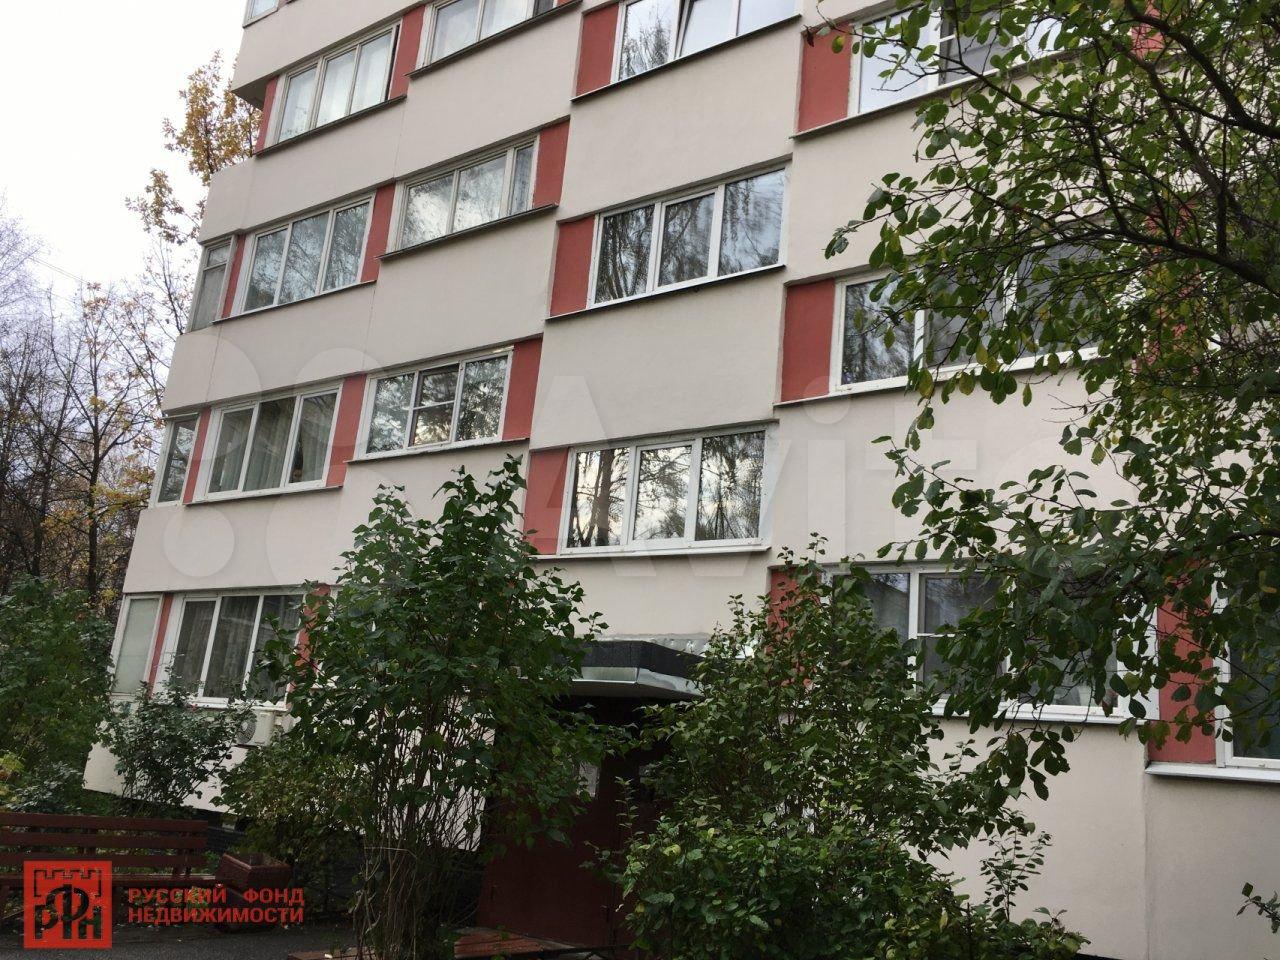 Козлова ул., д 25, корпус 1